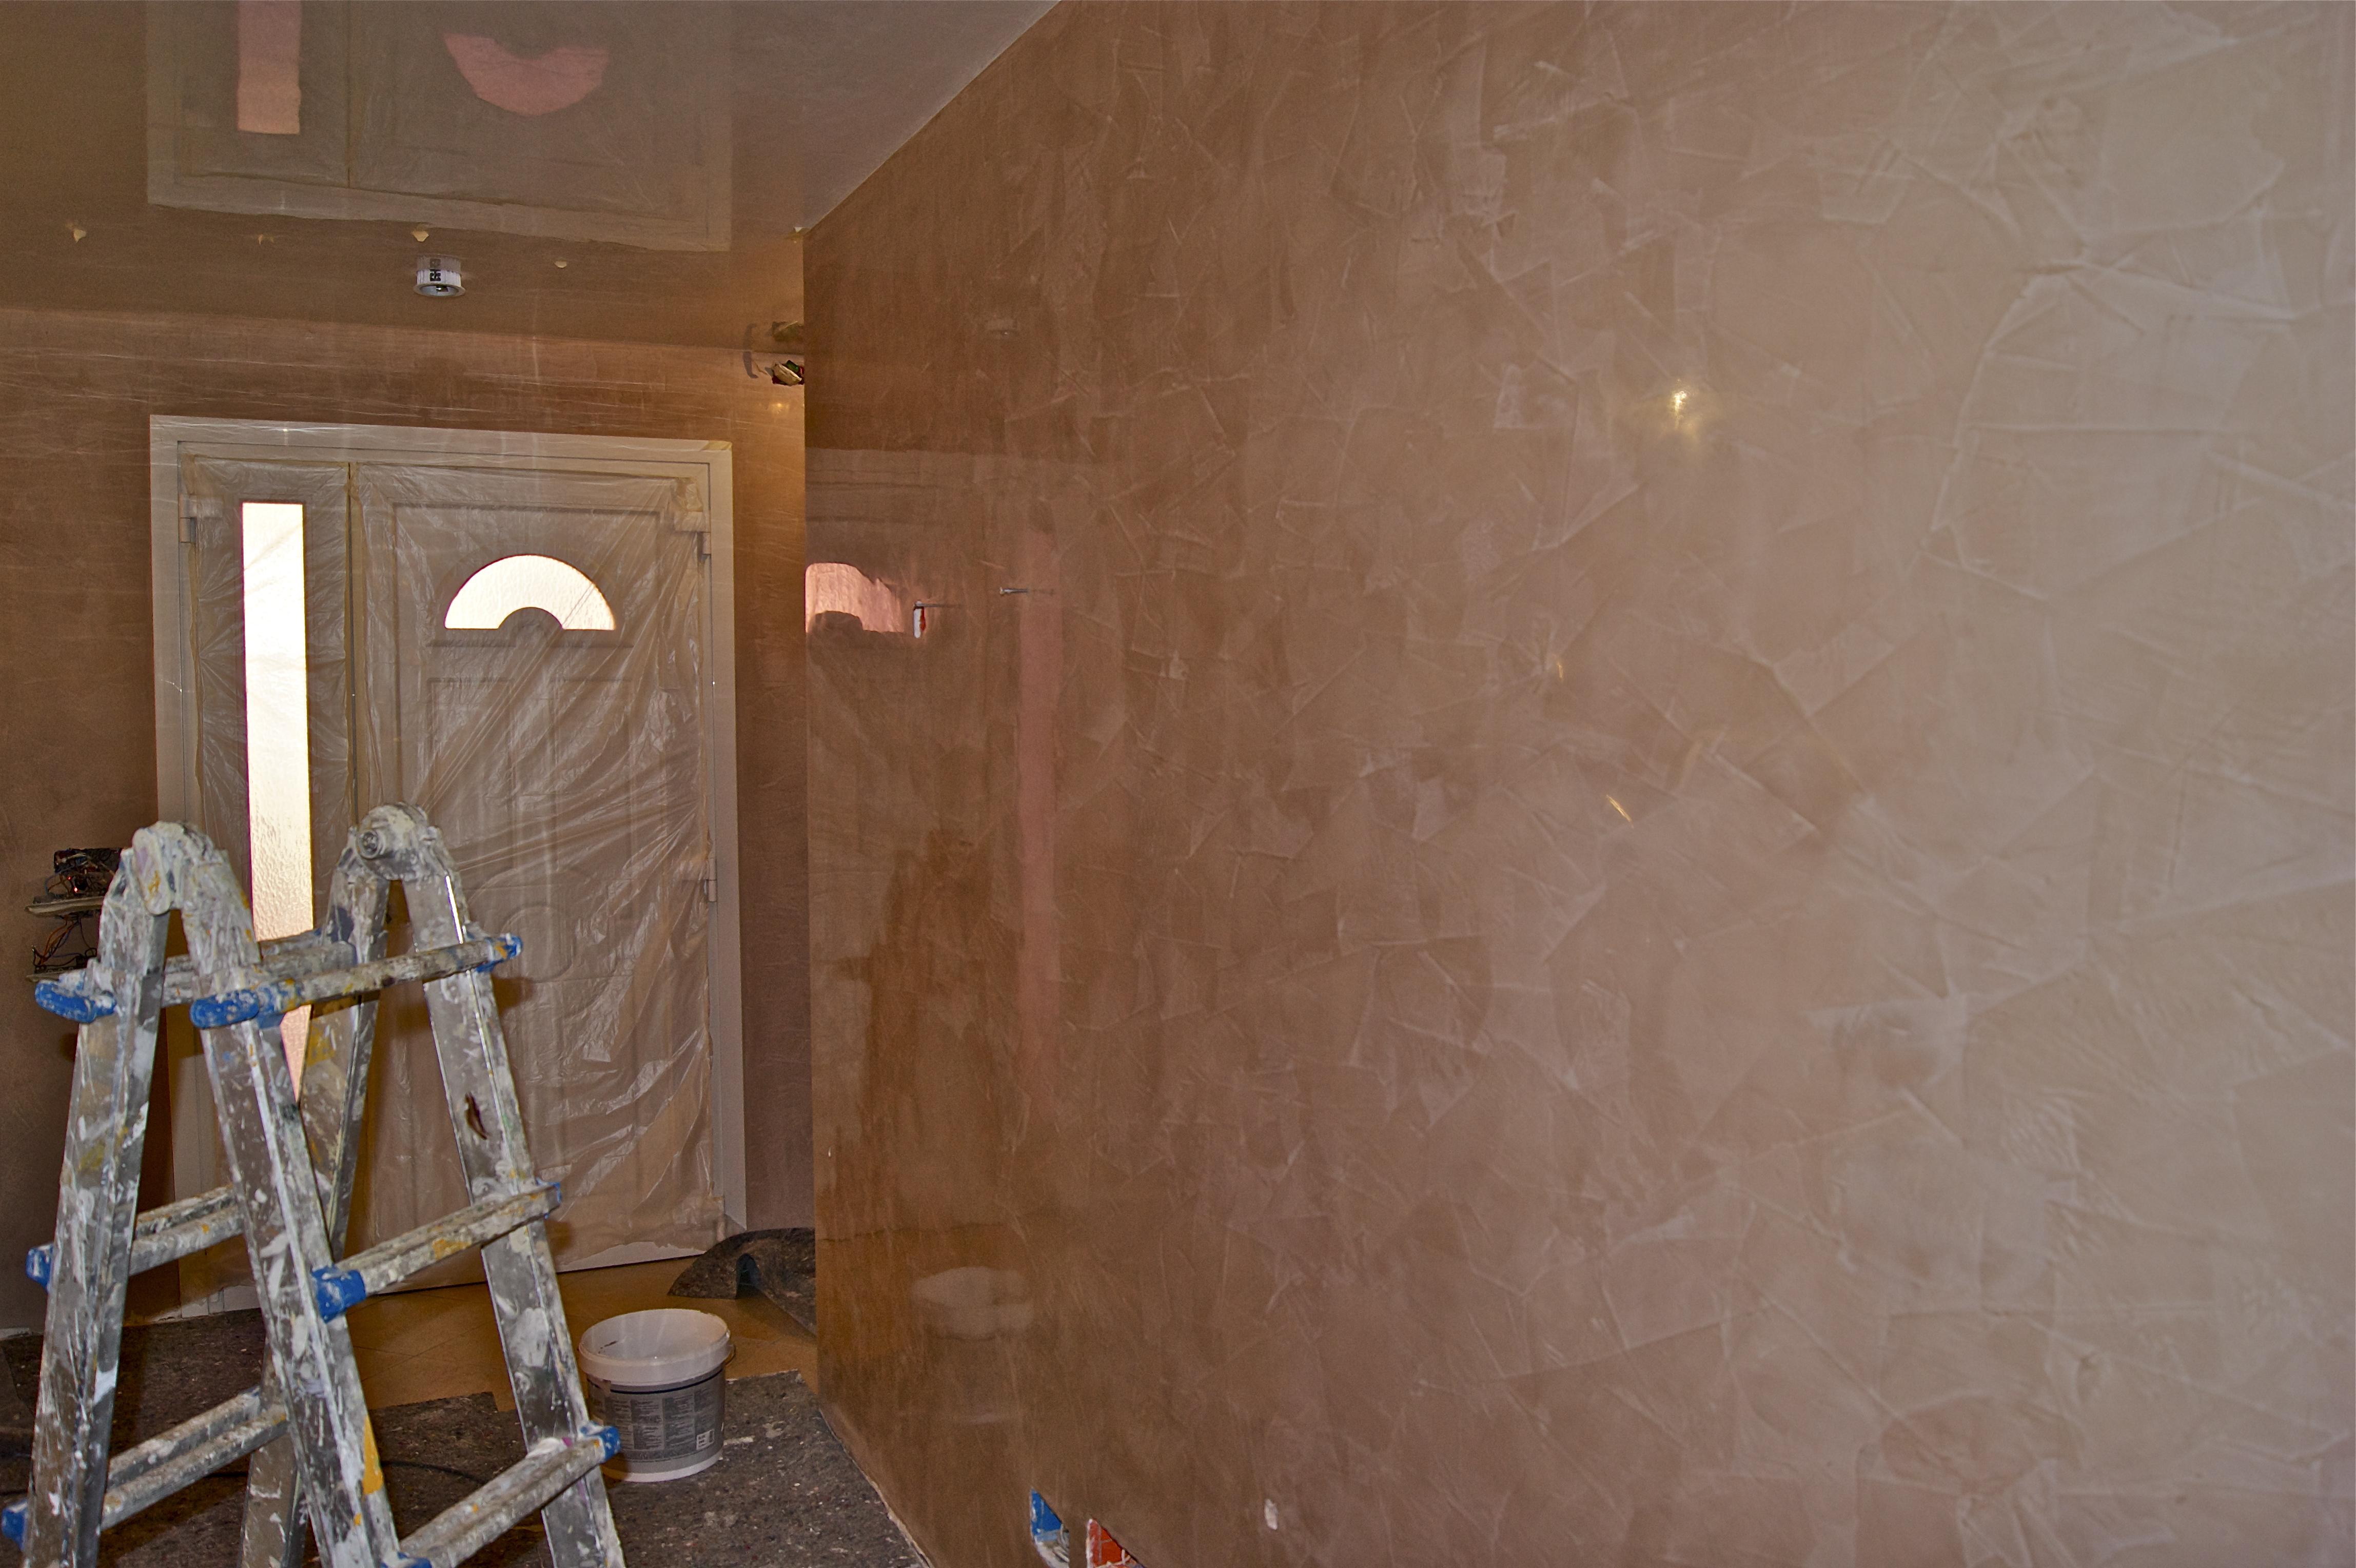 Imbianchino gallarate imbiancatura gallarate - Stucco veneziano in bagno ...